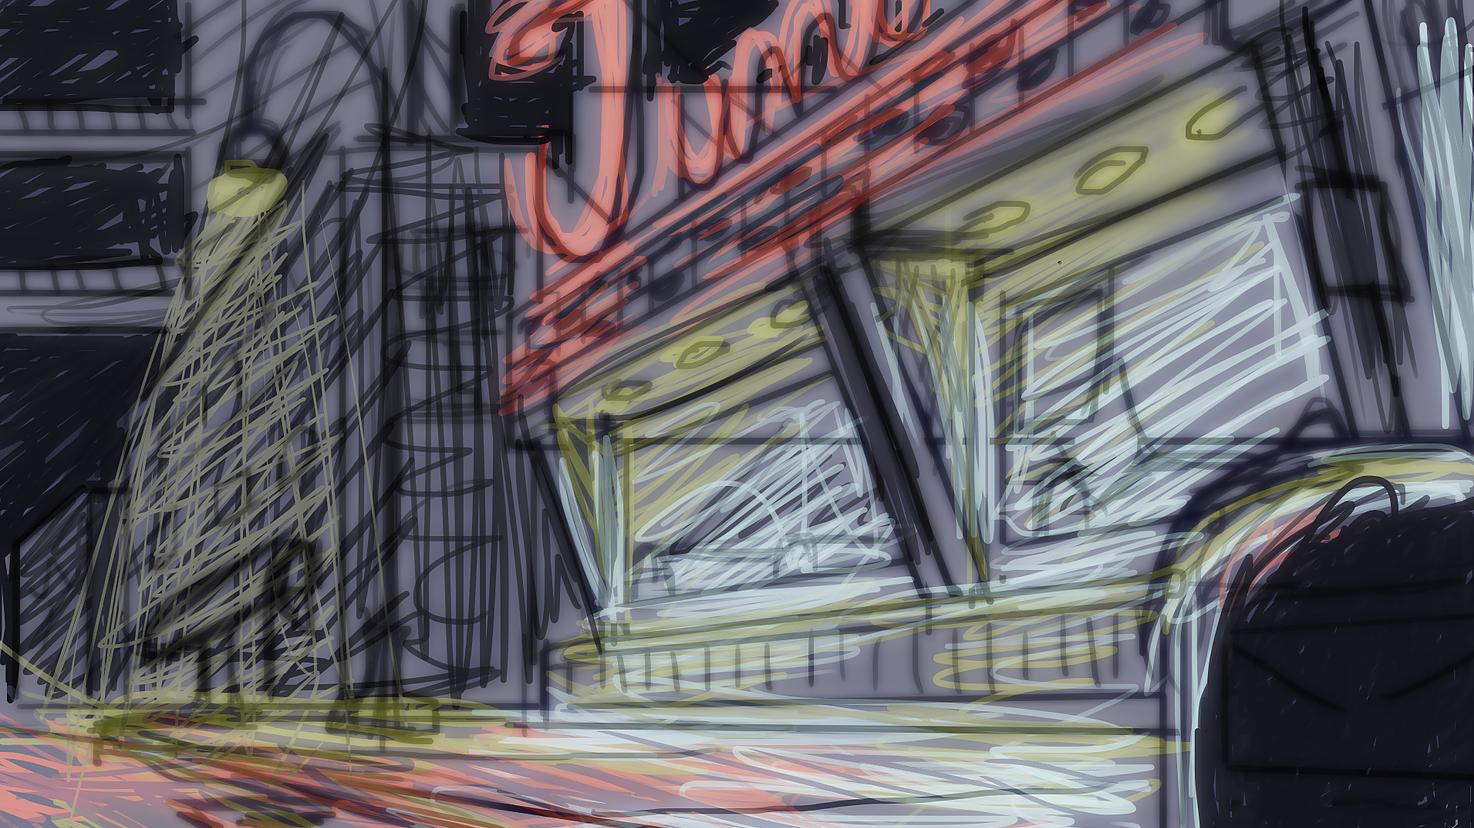 Digital sketch with rough lighting